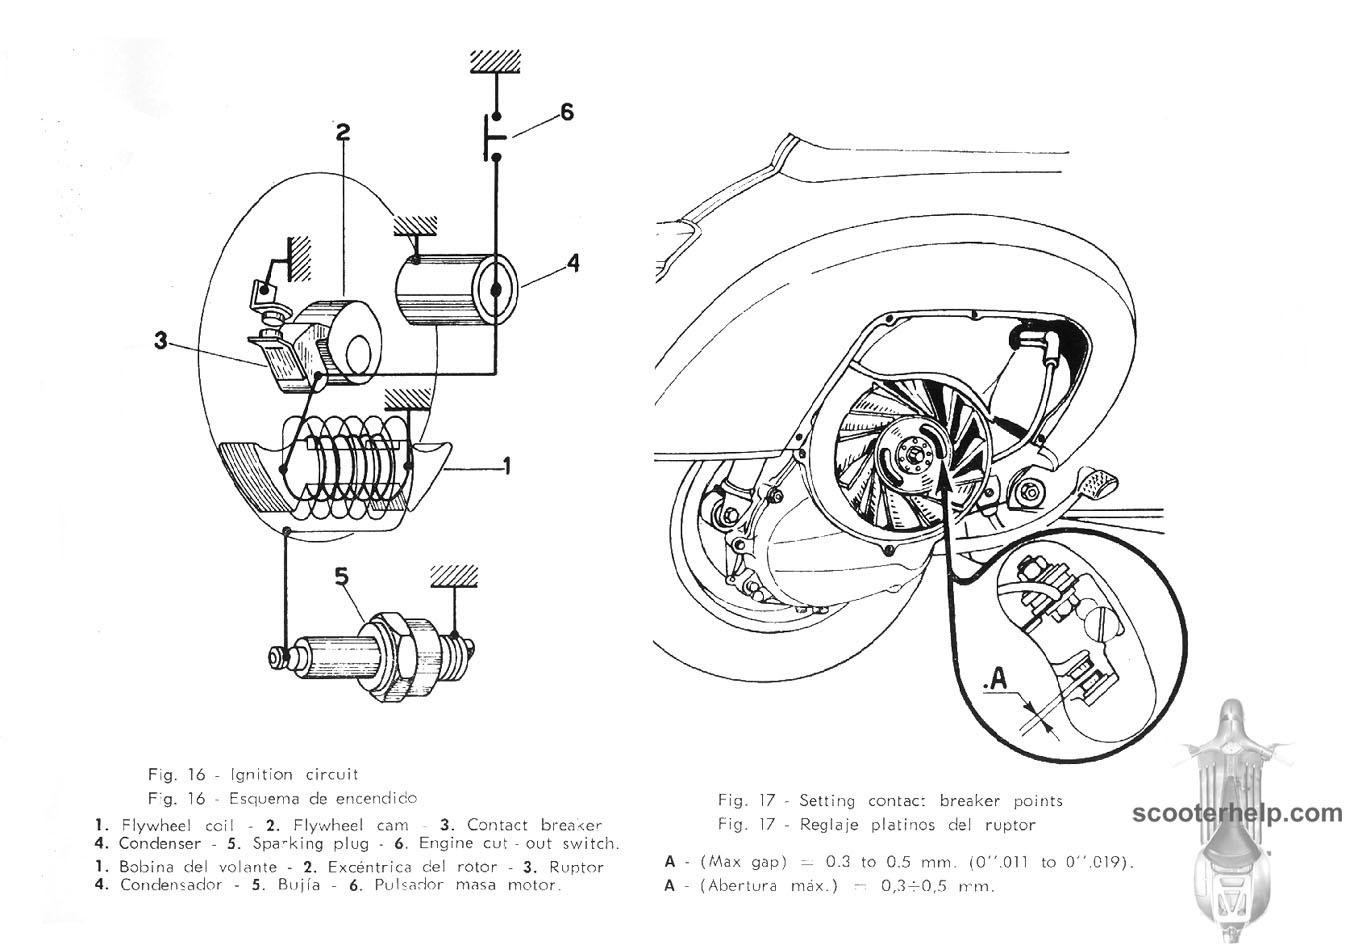 Vespa 90 Owner's Manual